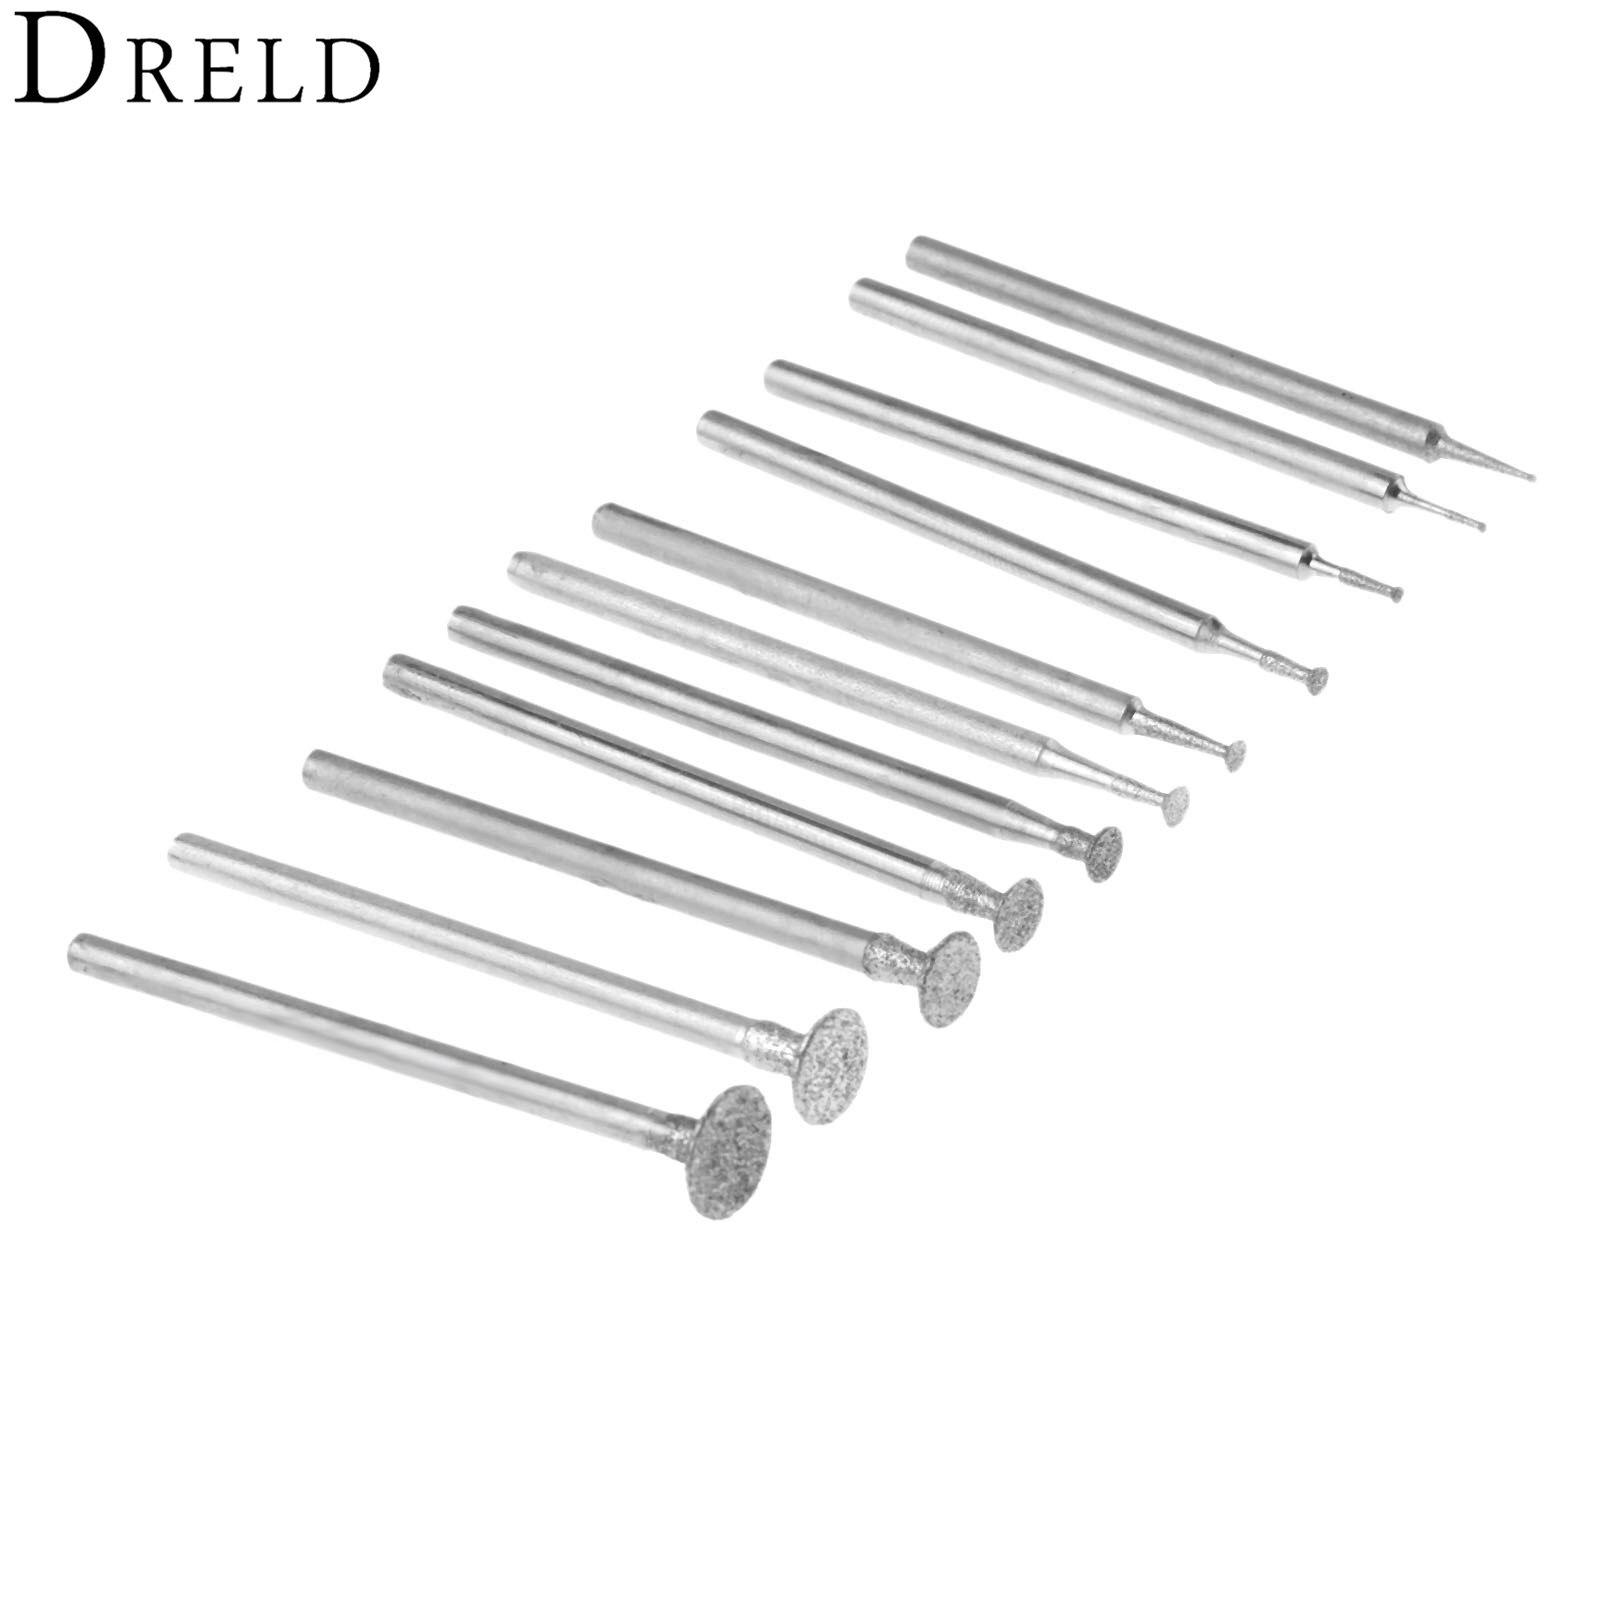 DRELD 11Pcs 2.35mm Shank Carborundum Electric Polishing Grinding Head Buffing Polishing Wheel For Dremel Rotary Tools H Needle